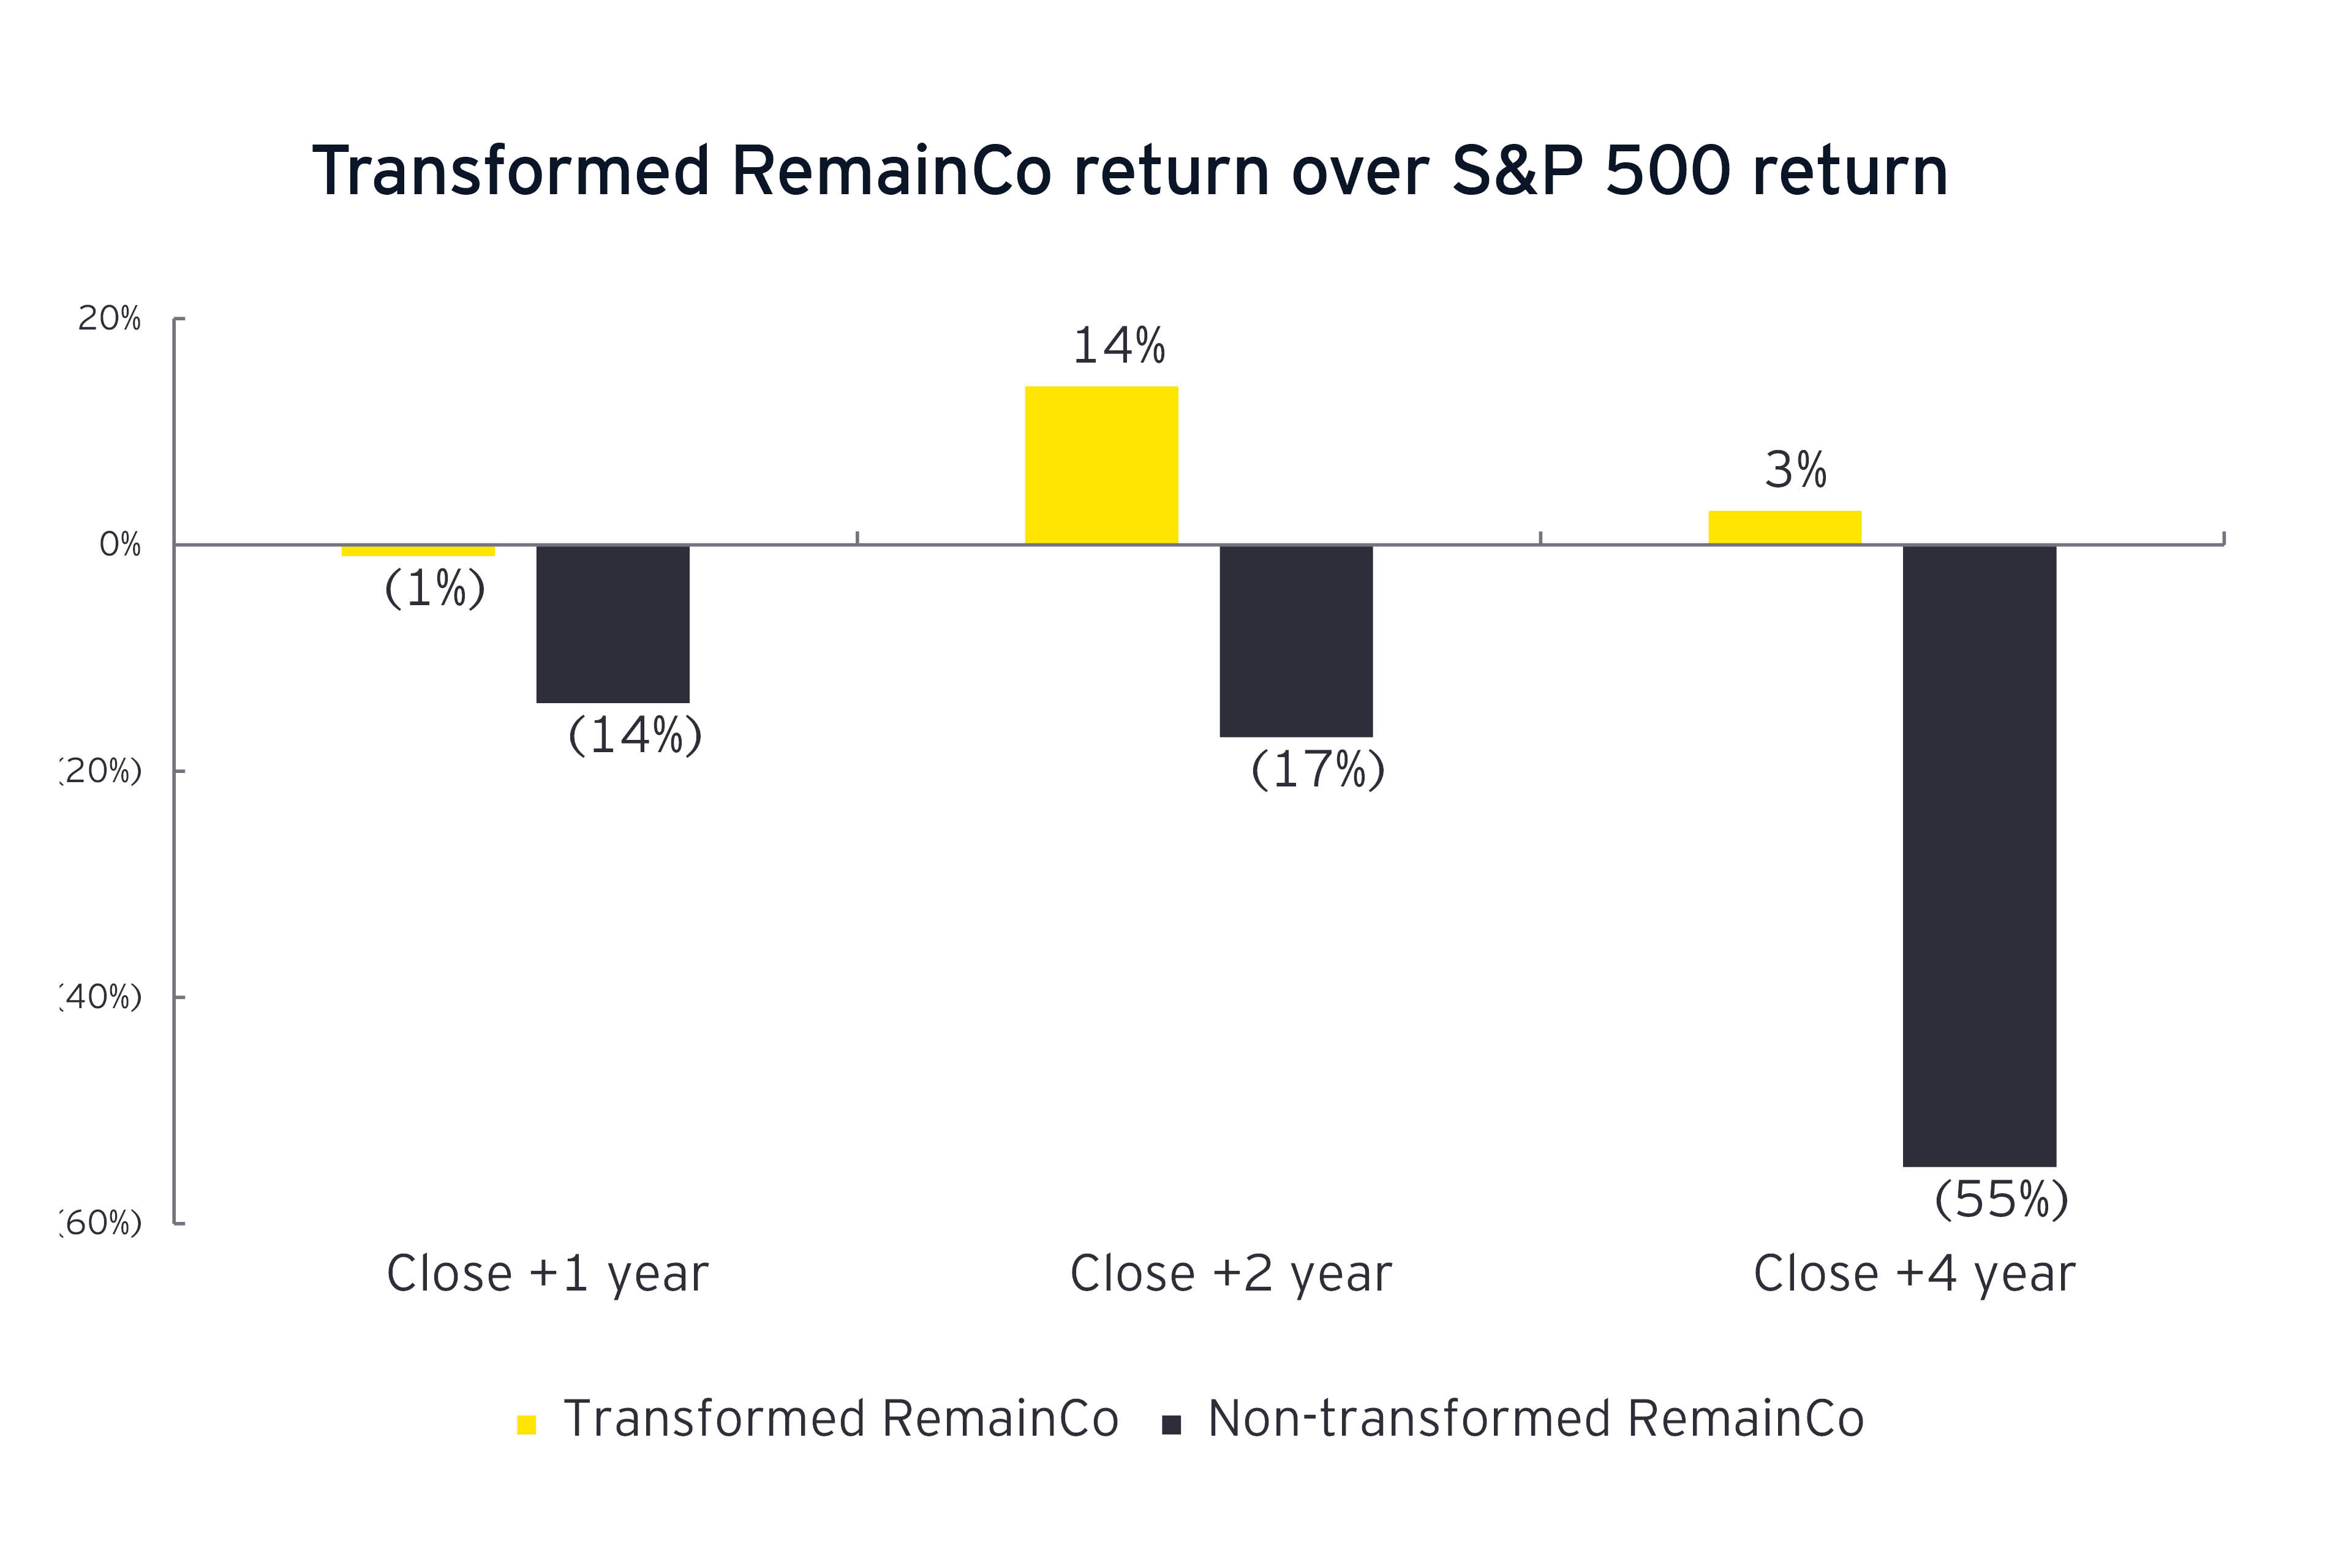 Transformed RemainCo return over S&P 500 return